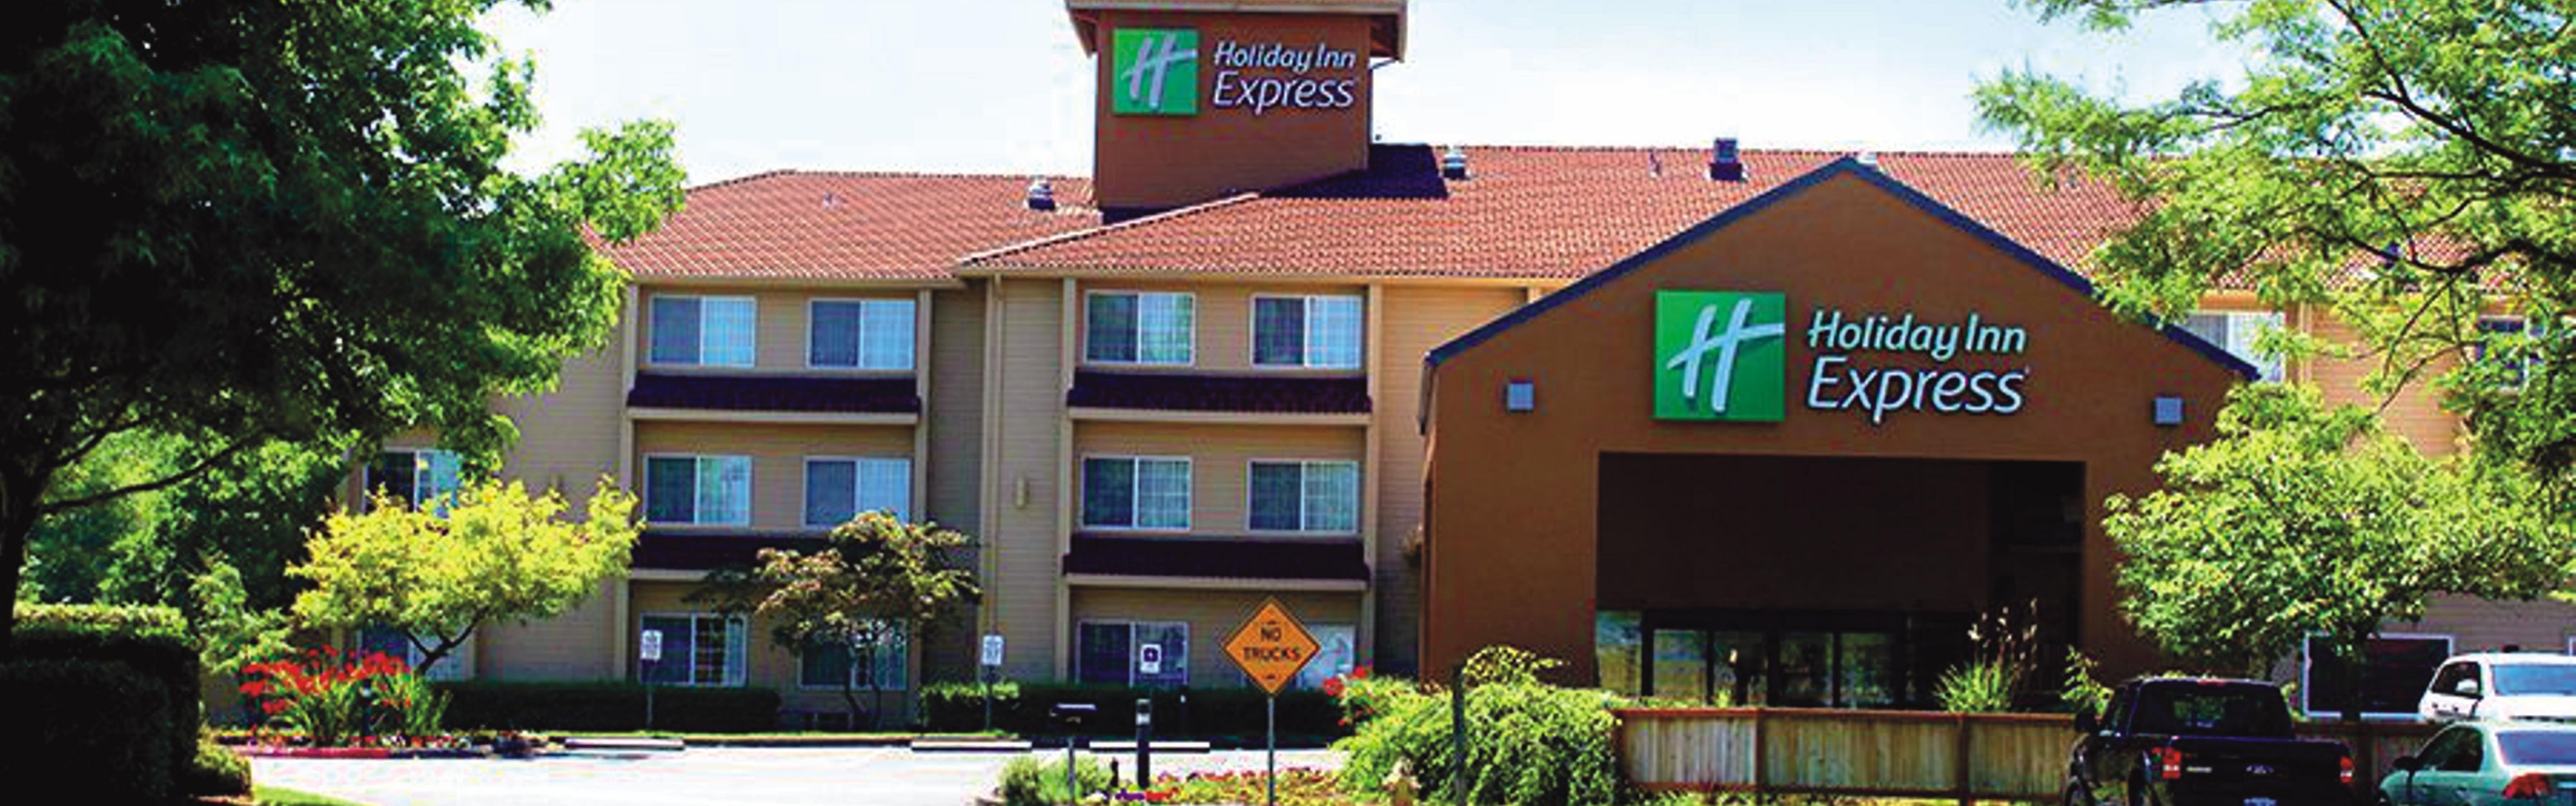 Holiday Inn Express Portland Oregon